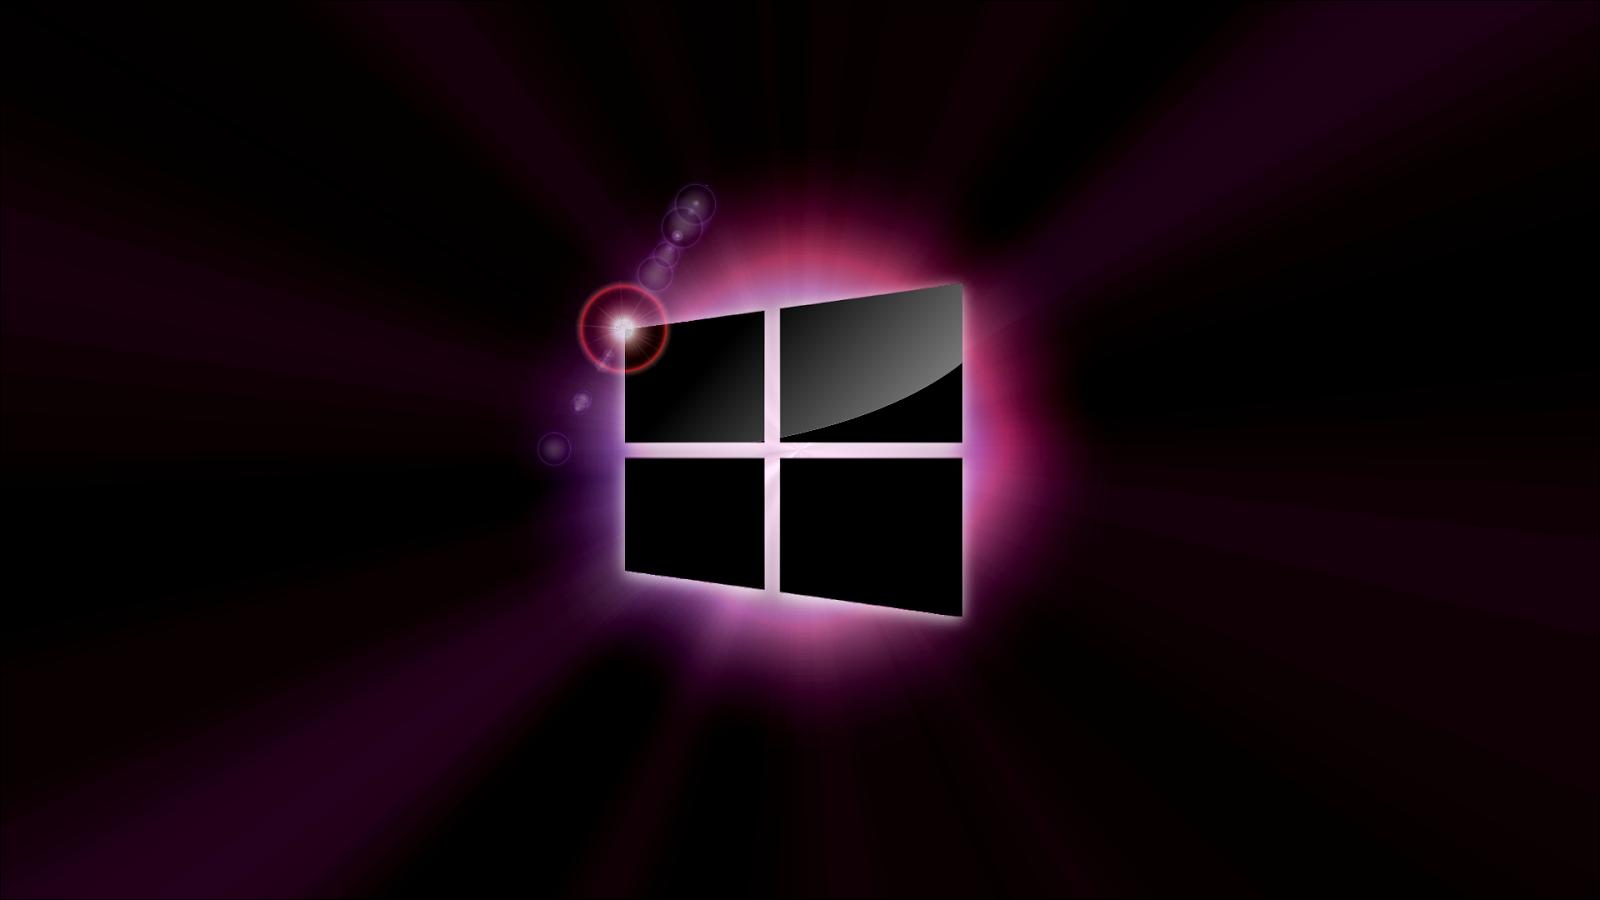 Cute Cartoon Wallpapers For Desktop Black Windows 8 Wallpapers Hindi Motivational Quotes